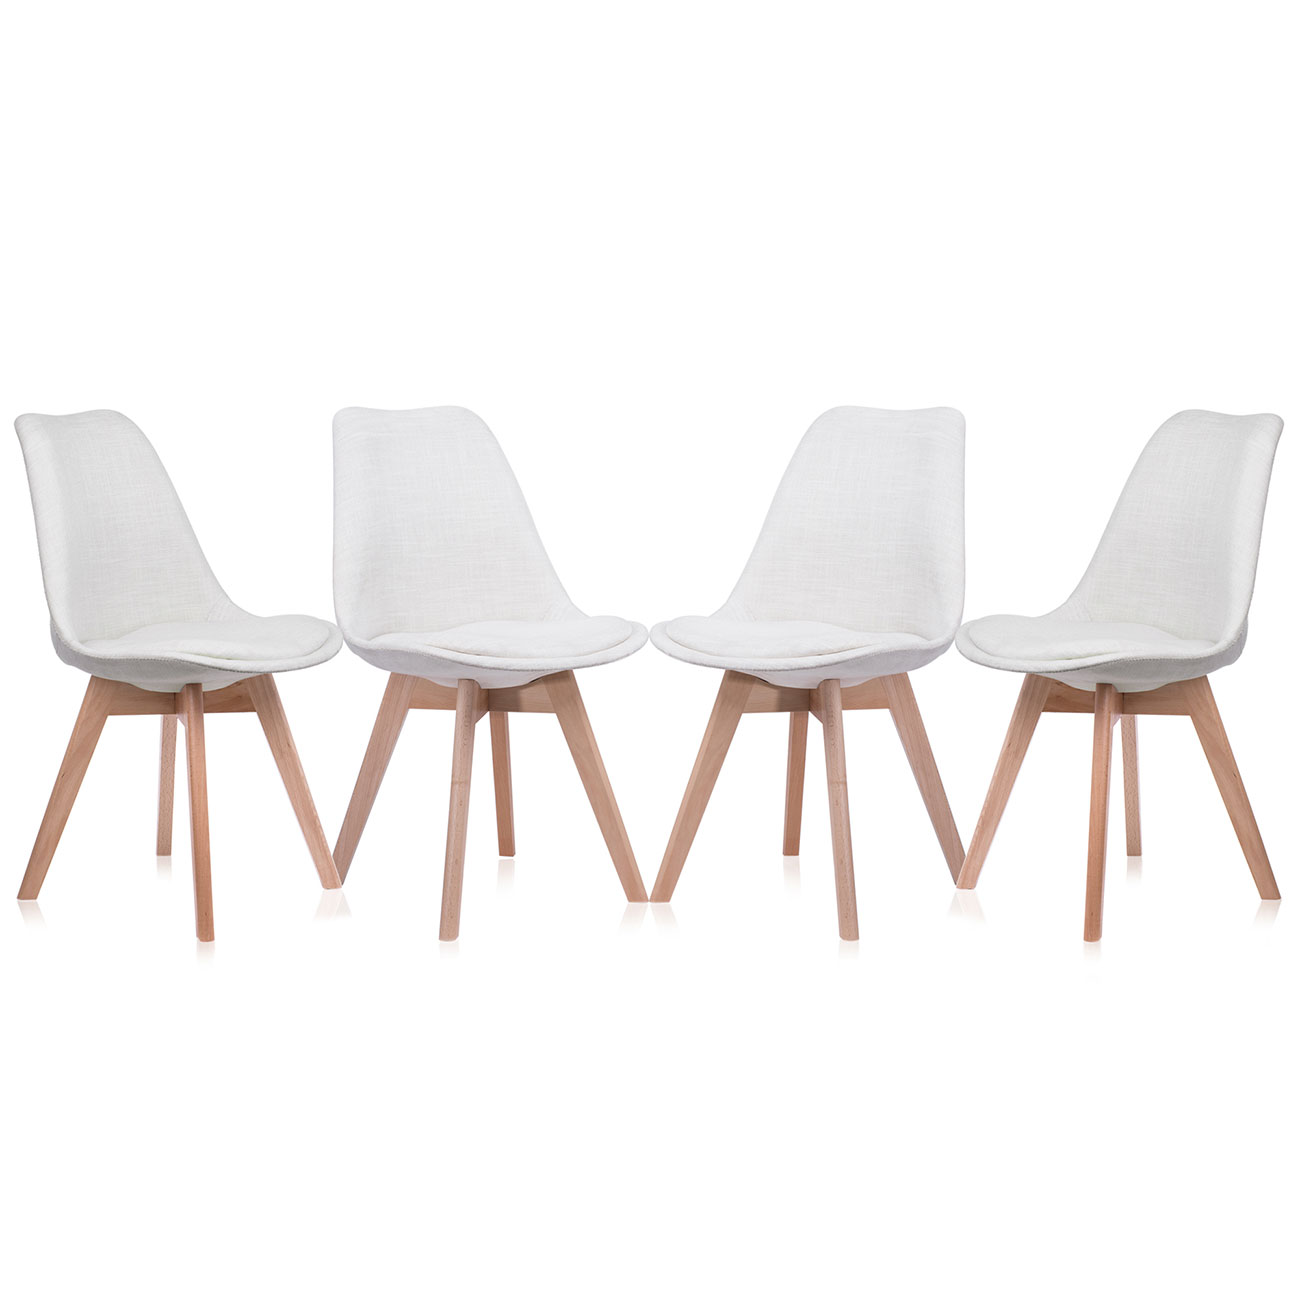 Makika retro stuhl design stuhl zura cream 4er set haus for Design stuhl freischwinger piet 30